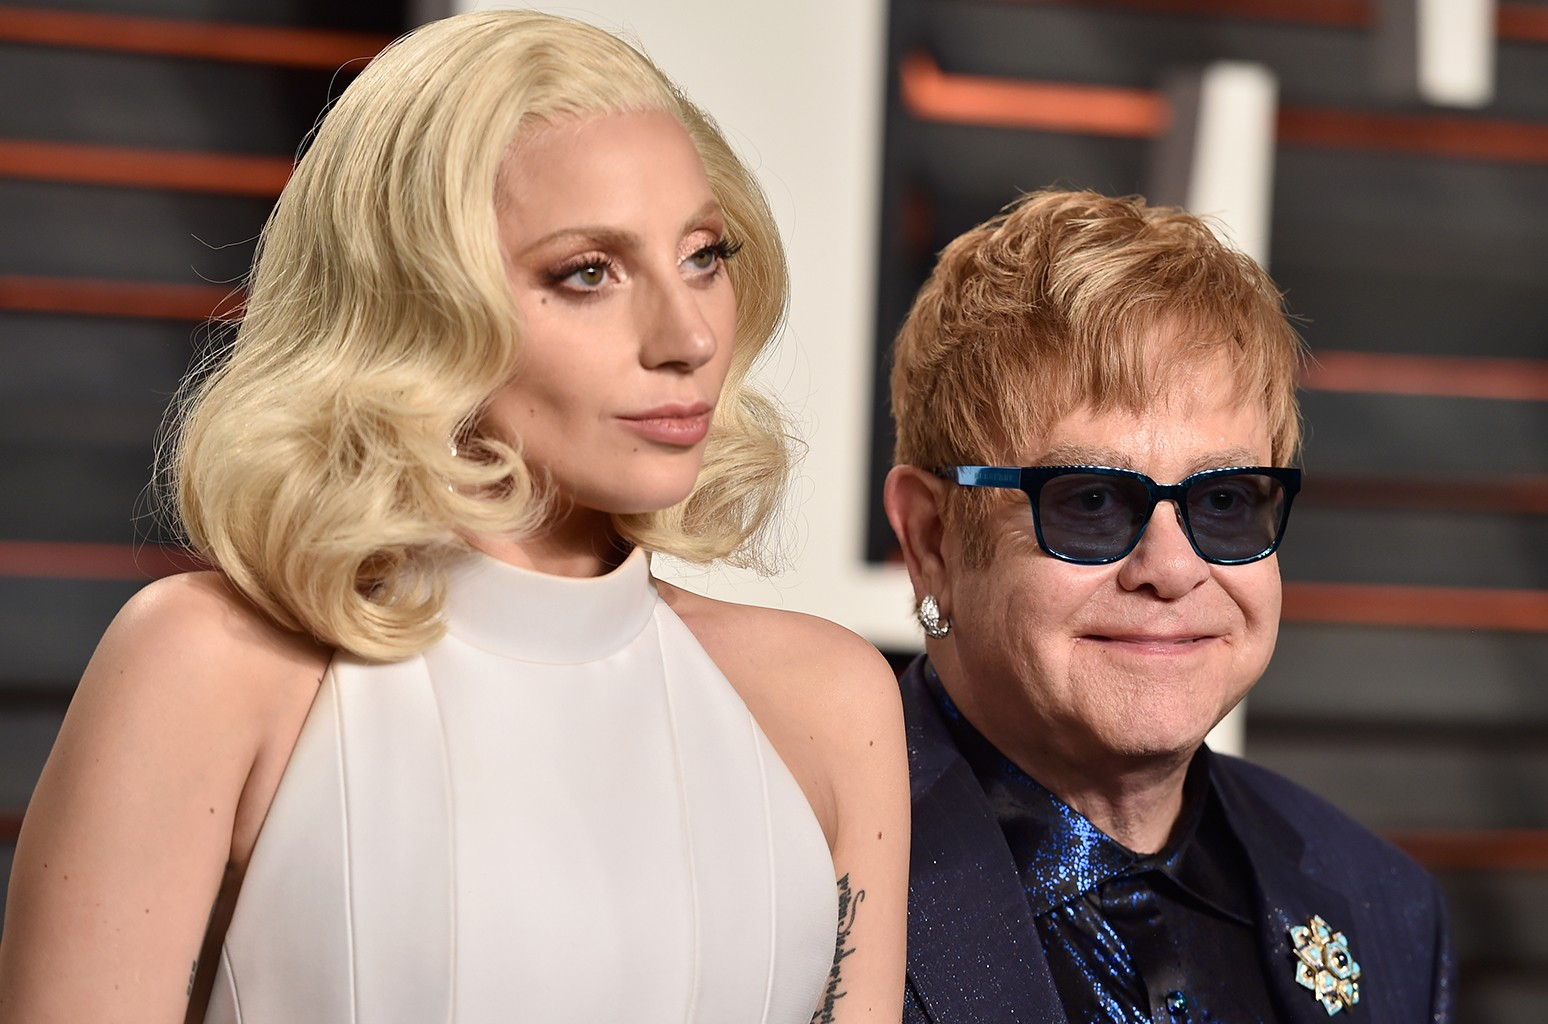 Lady Gaga and Elton John at the 2016 Vanity Fair Oscar Party